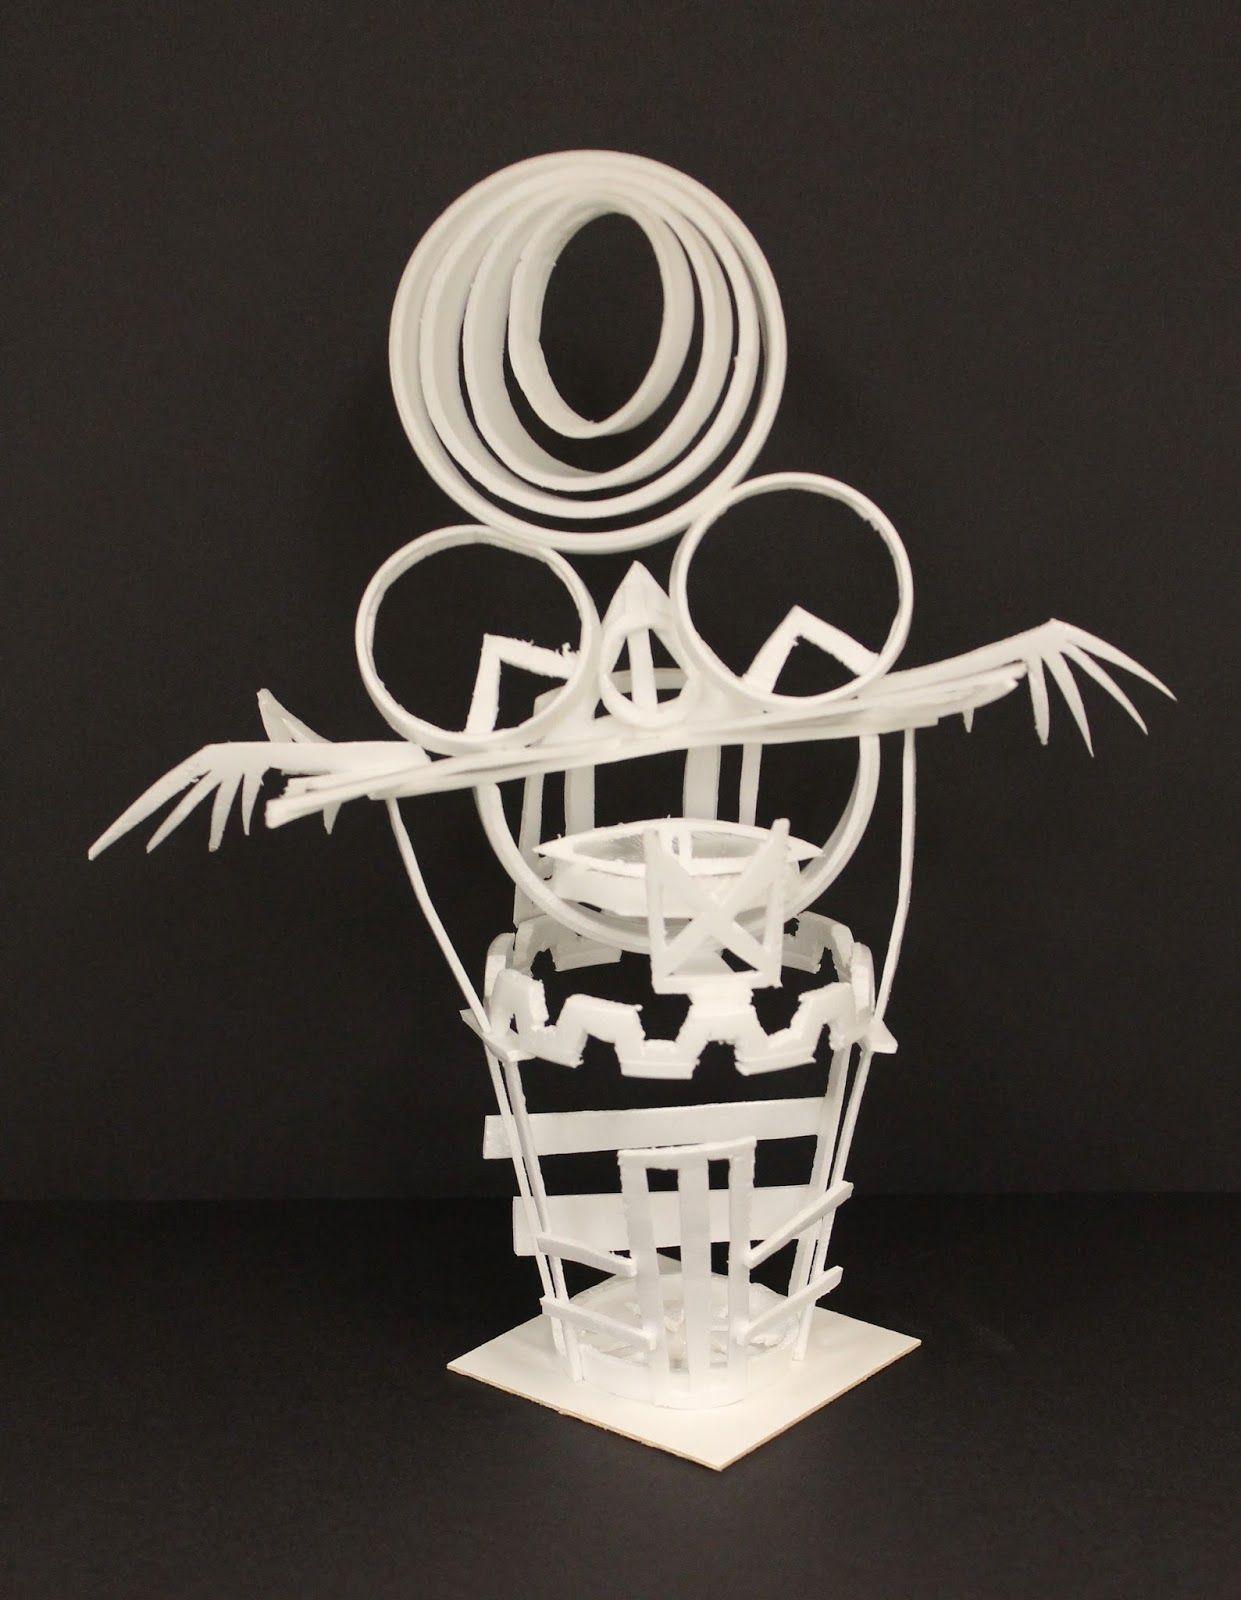 Styrogami Styrofoam Cup Sculpture